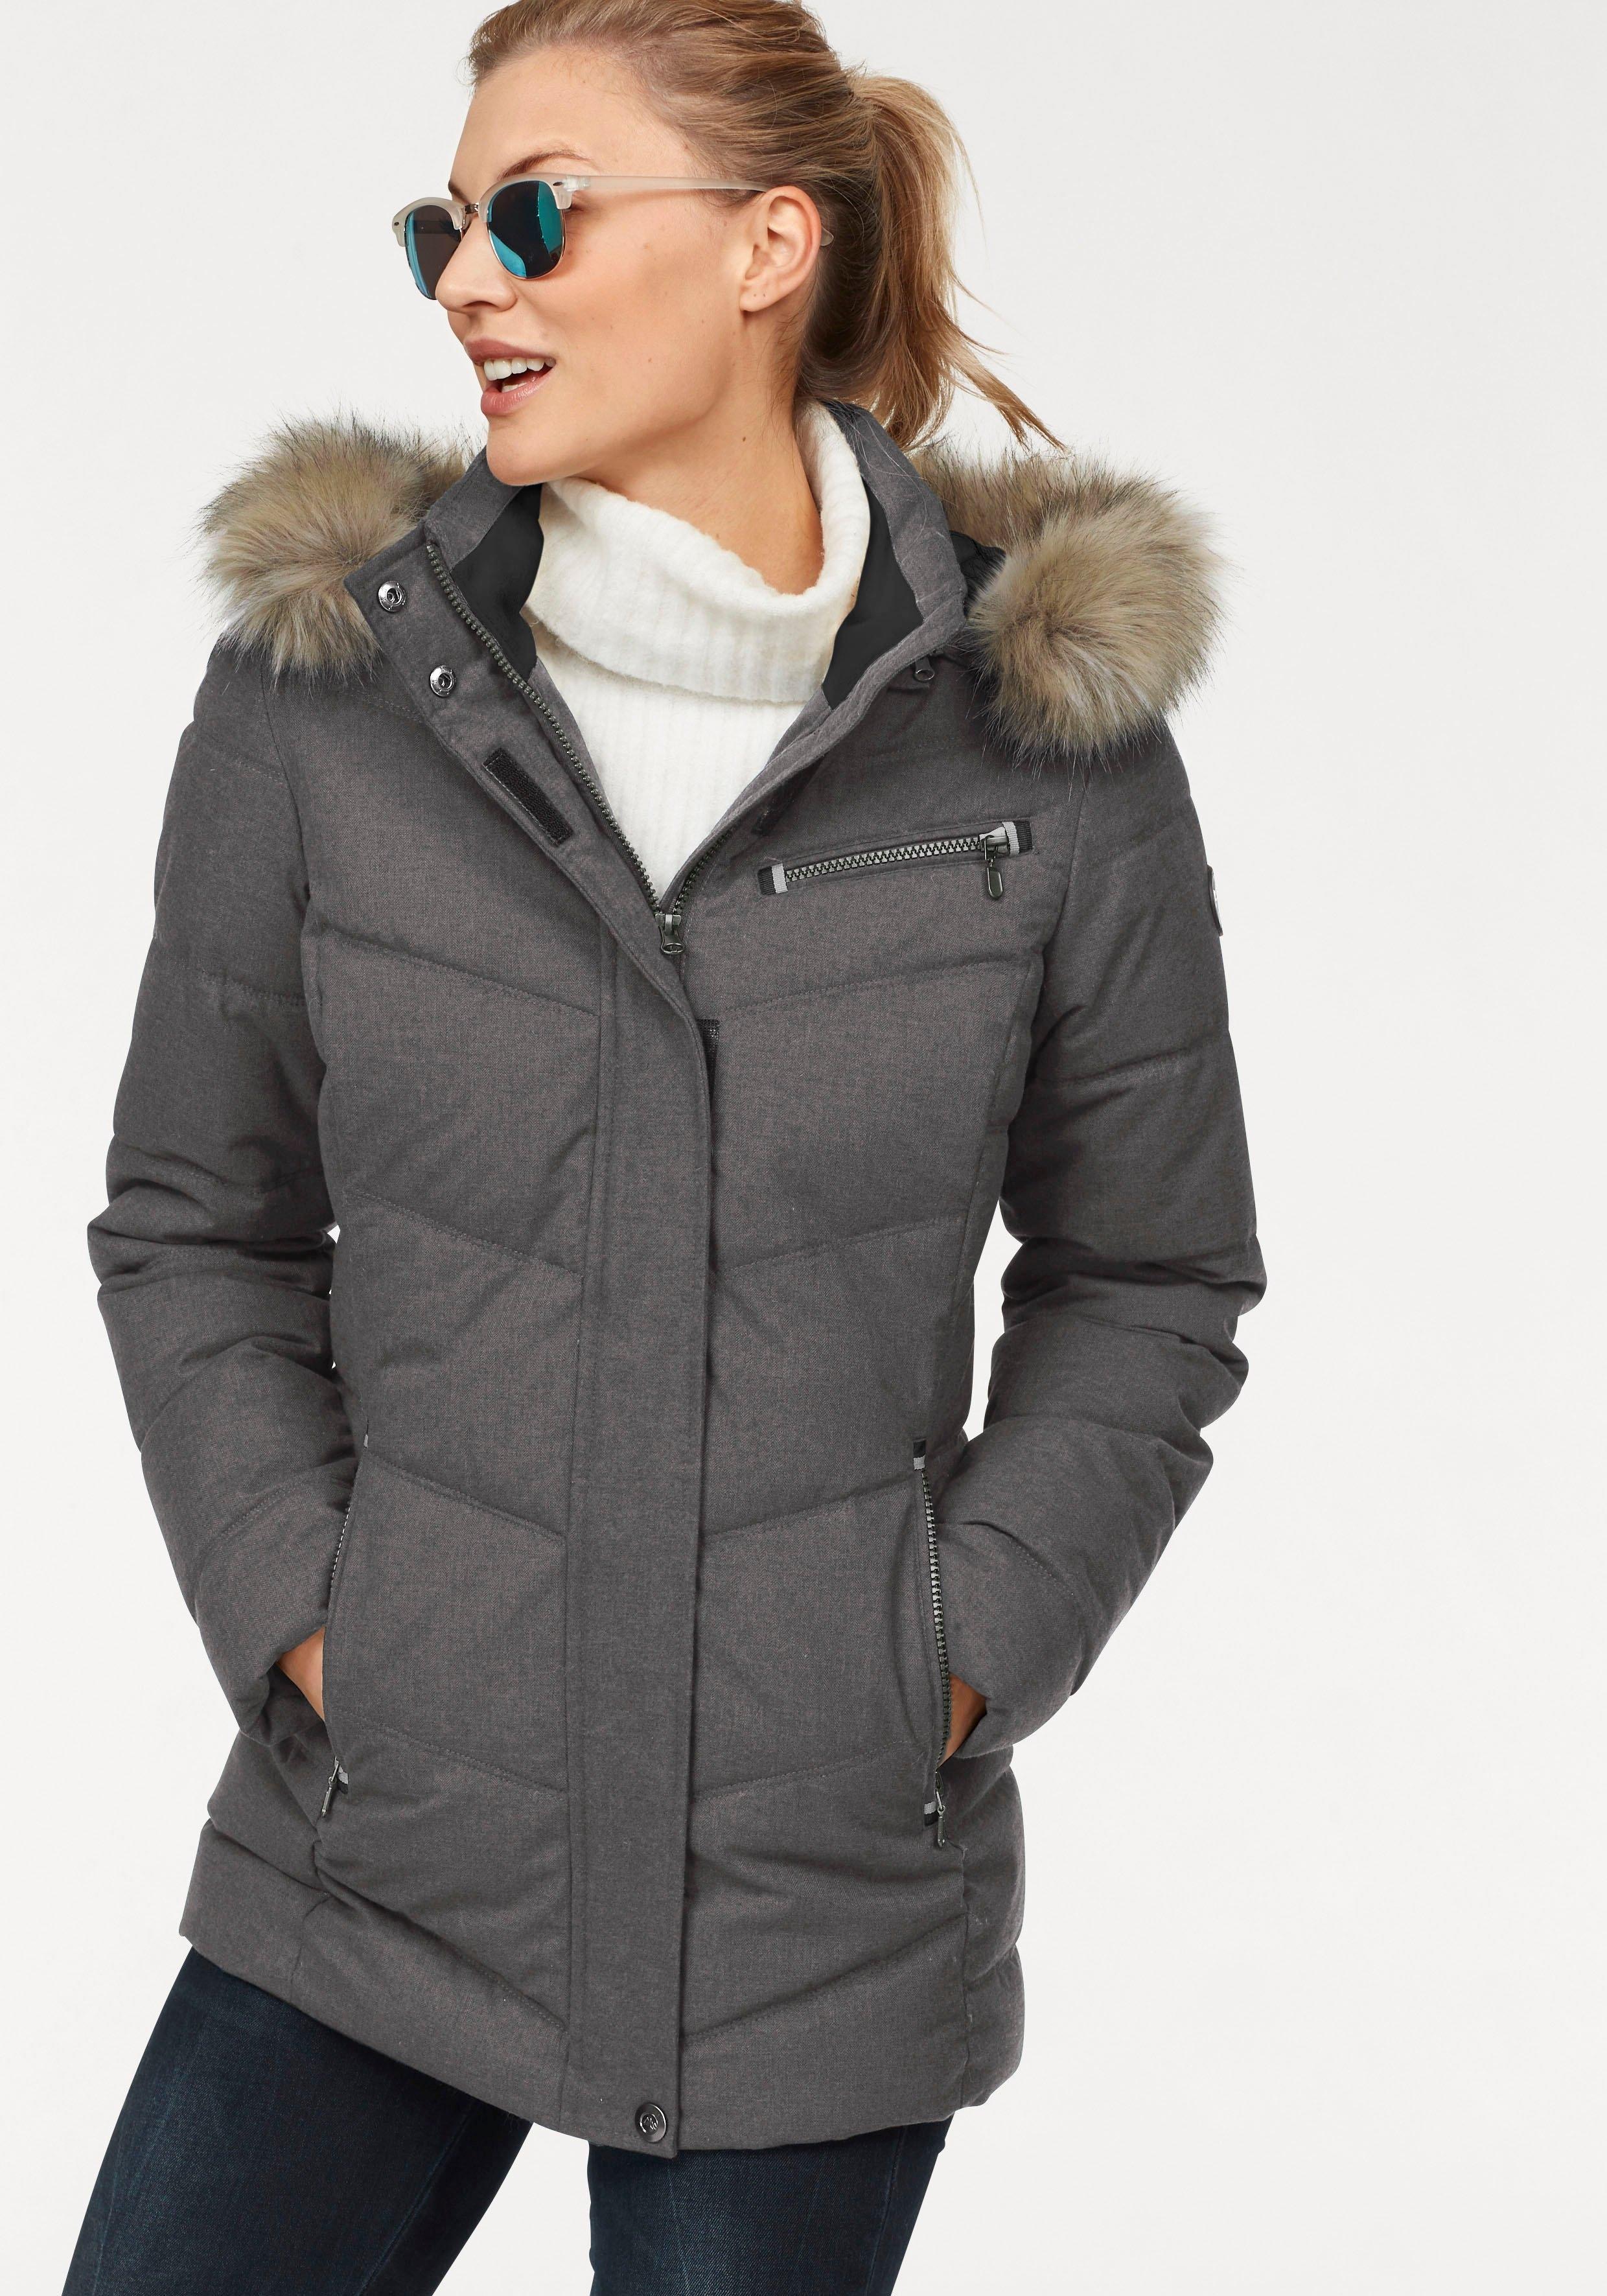 Polarino gewatteerde jas nu online bestellen